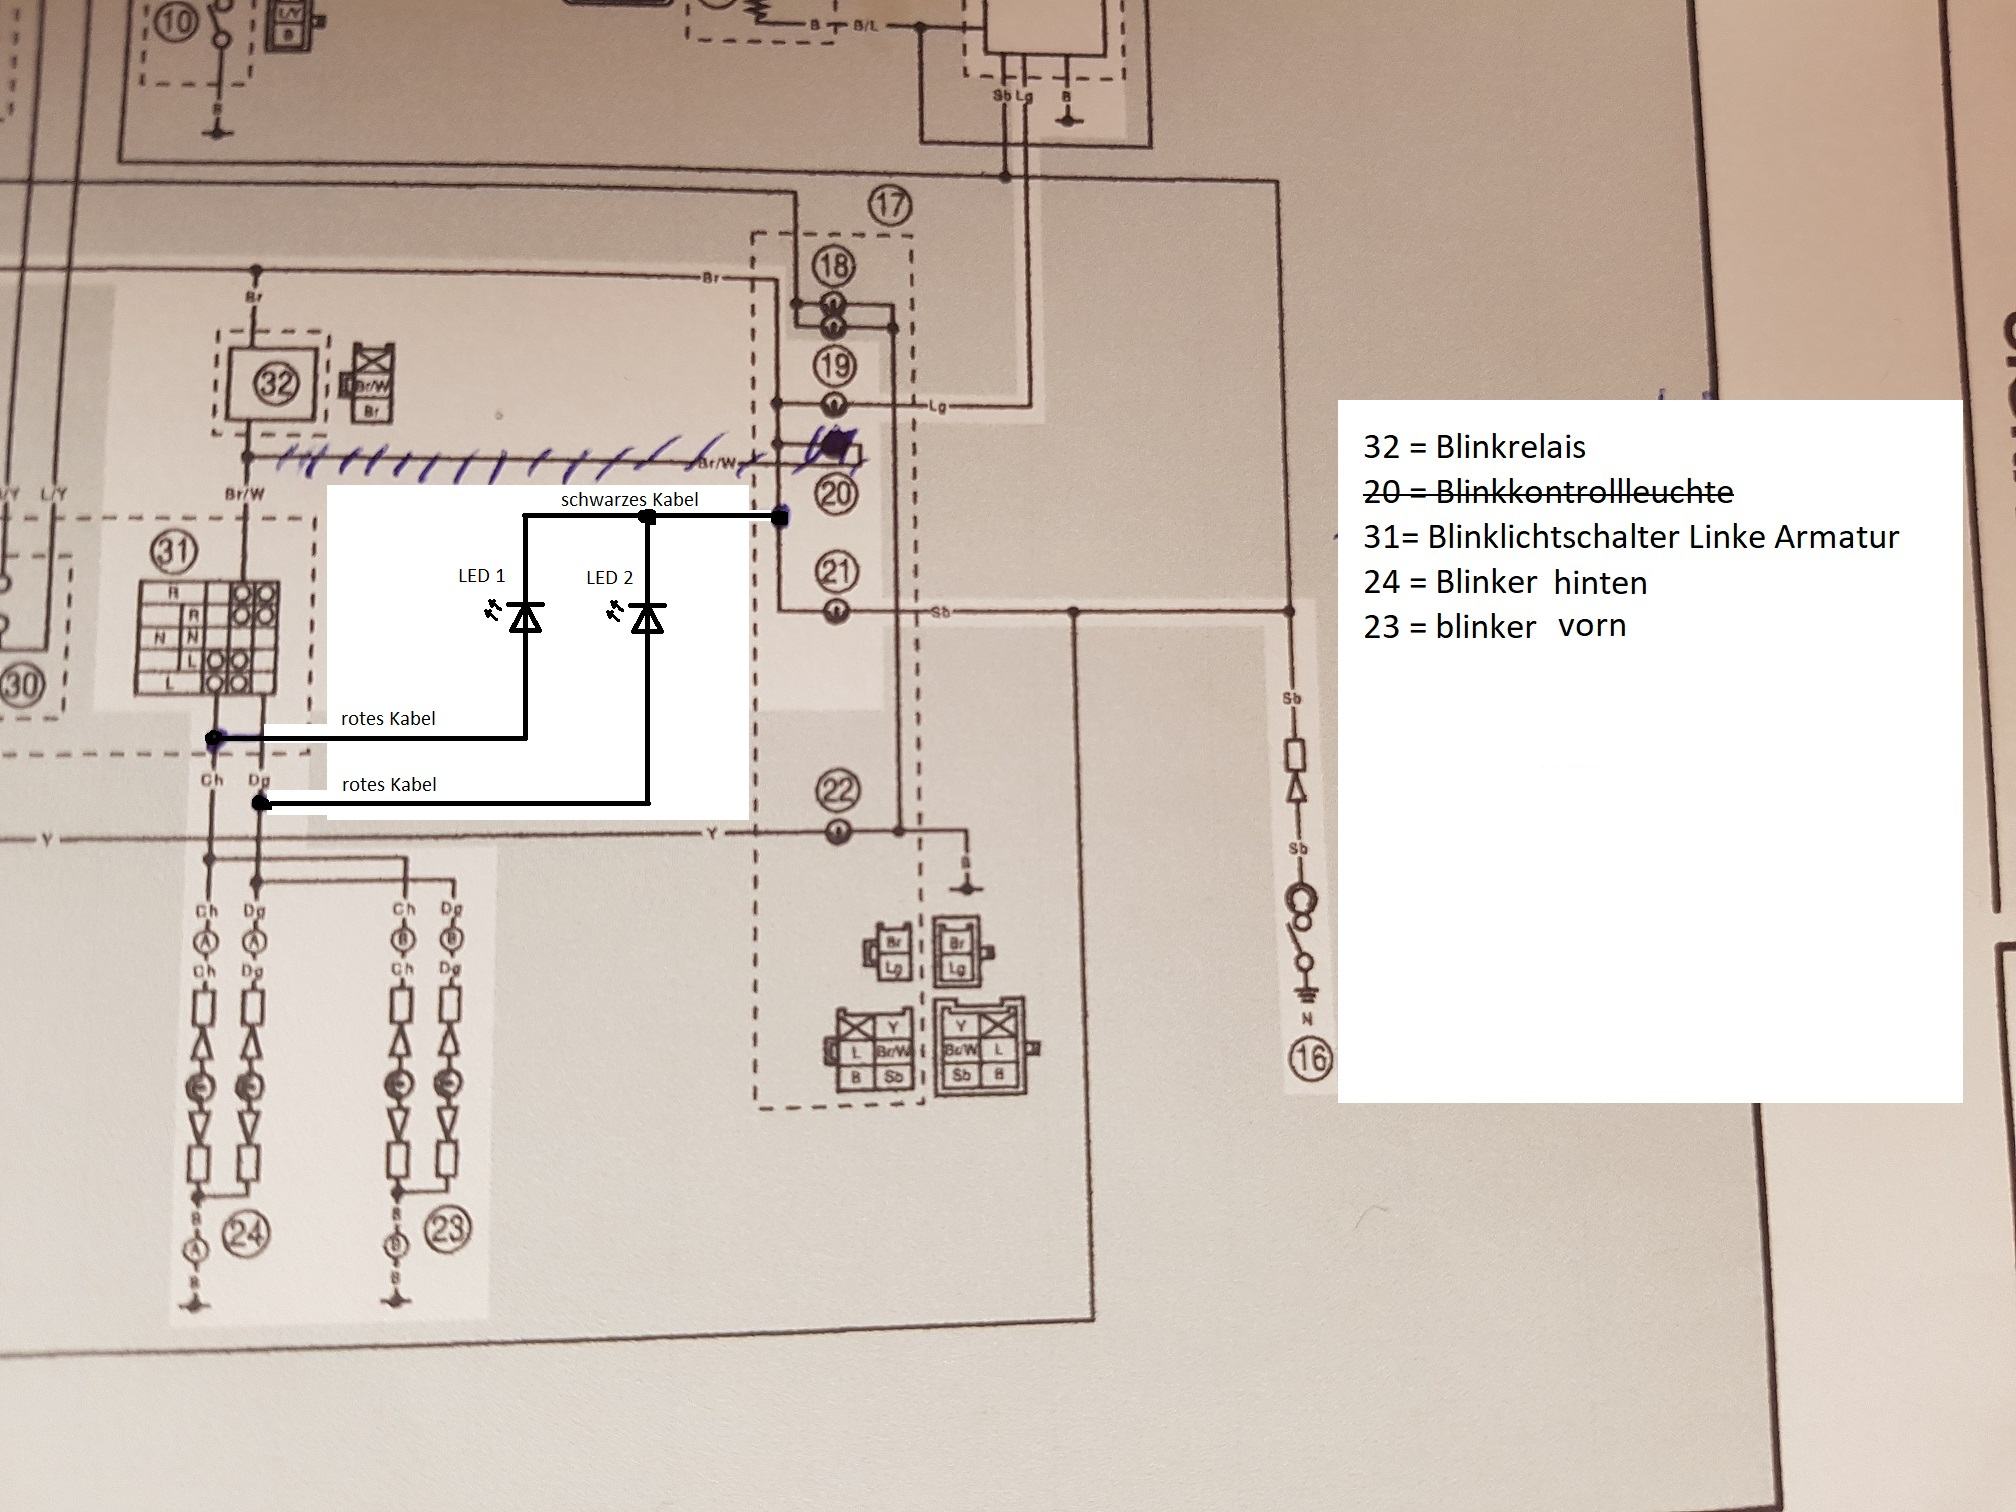 neues projekt xvs 650 drag star seite 5 yamaha. Black Bedroom Furniture Sets. Home Design Ideas